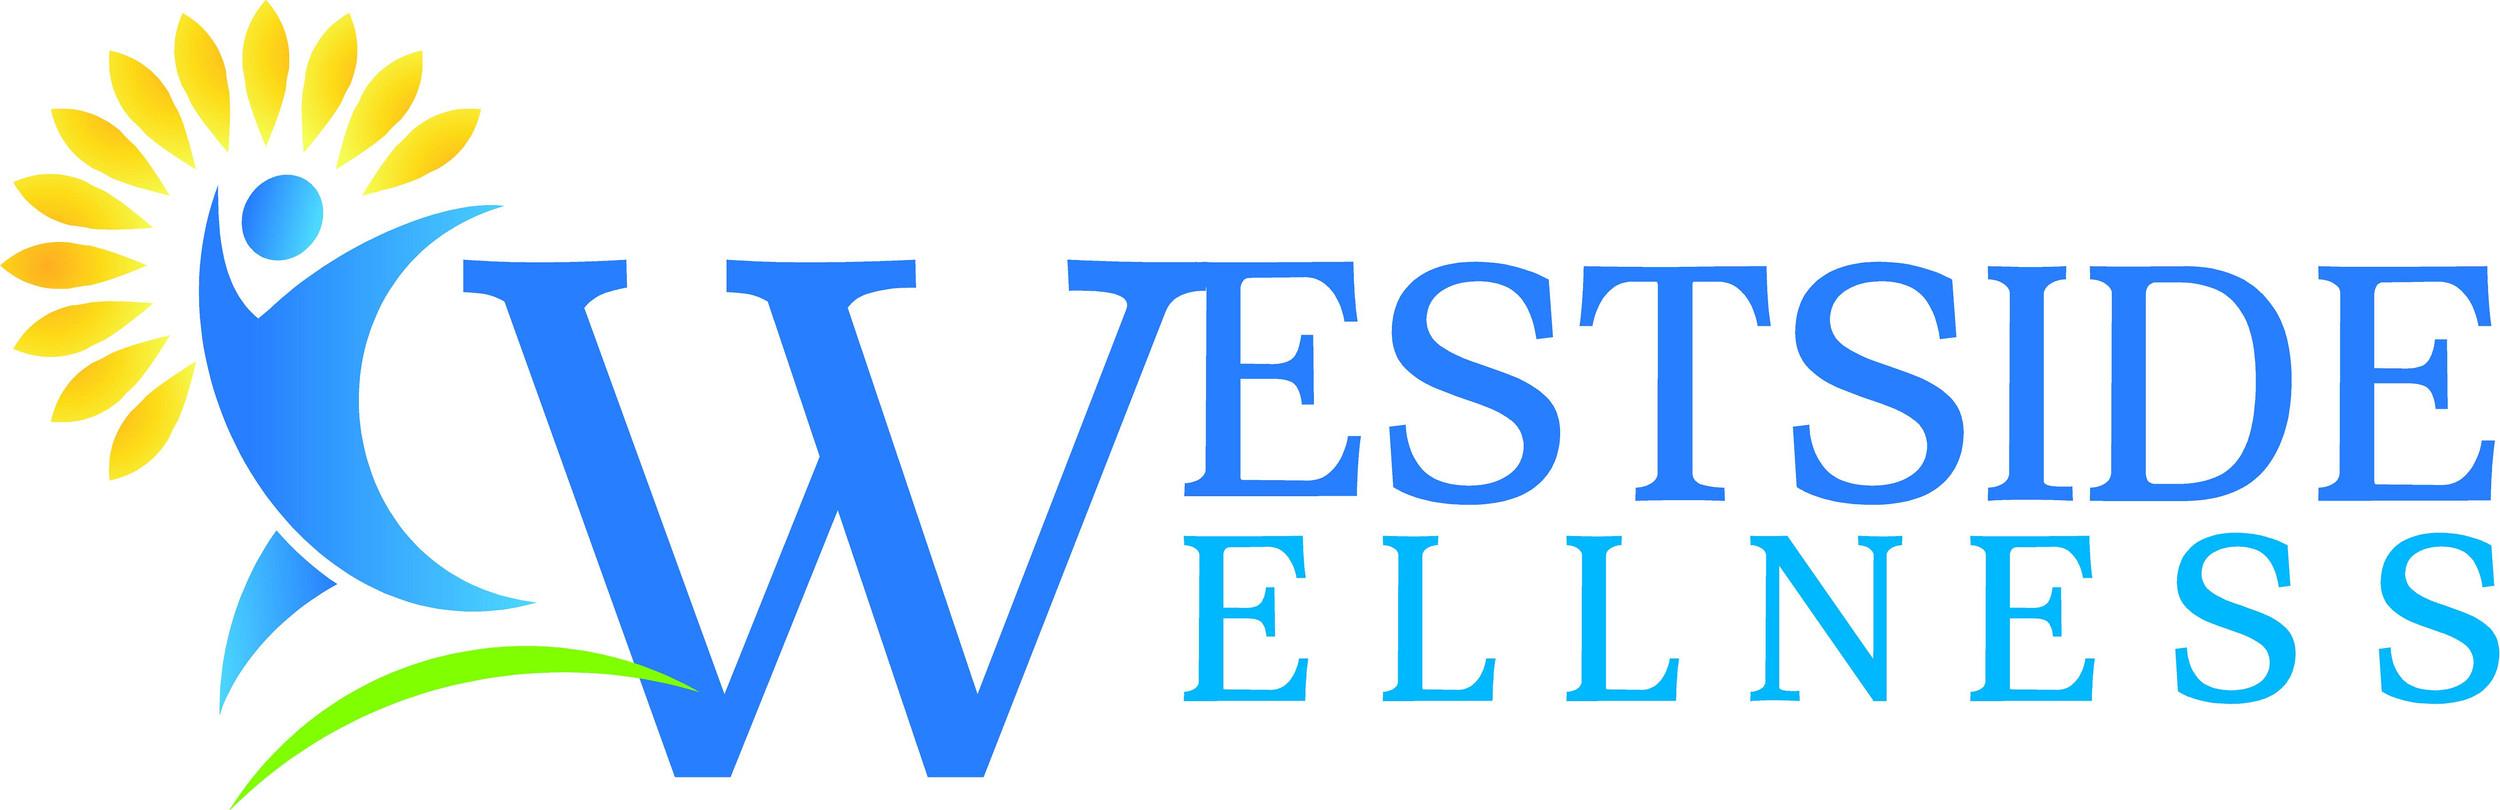 PRP-hair-restoration | TN 37922 | WestSide Wellness